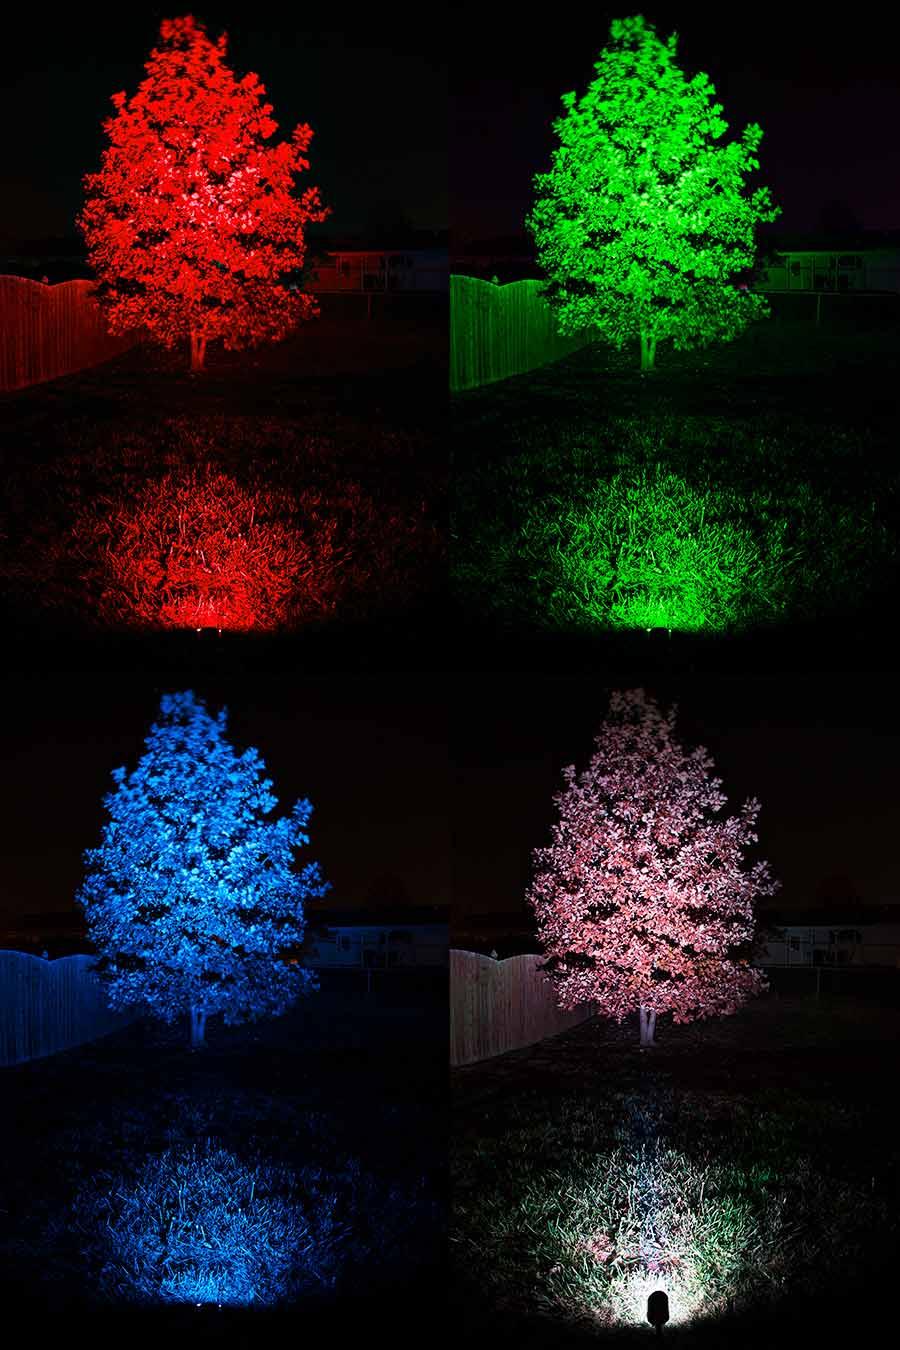 Color Changing 18w Rgb Led Landscape Spot Light Remote